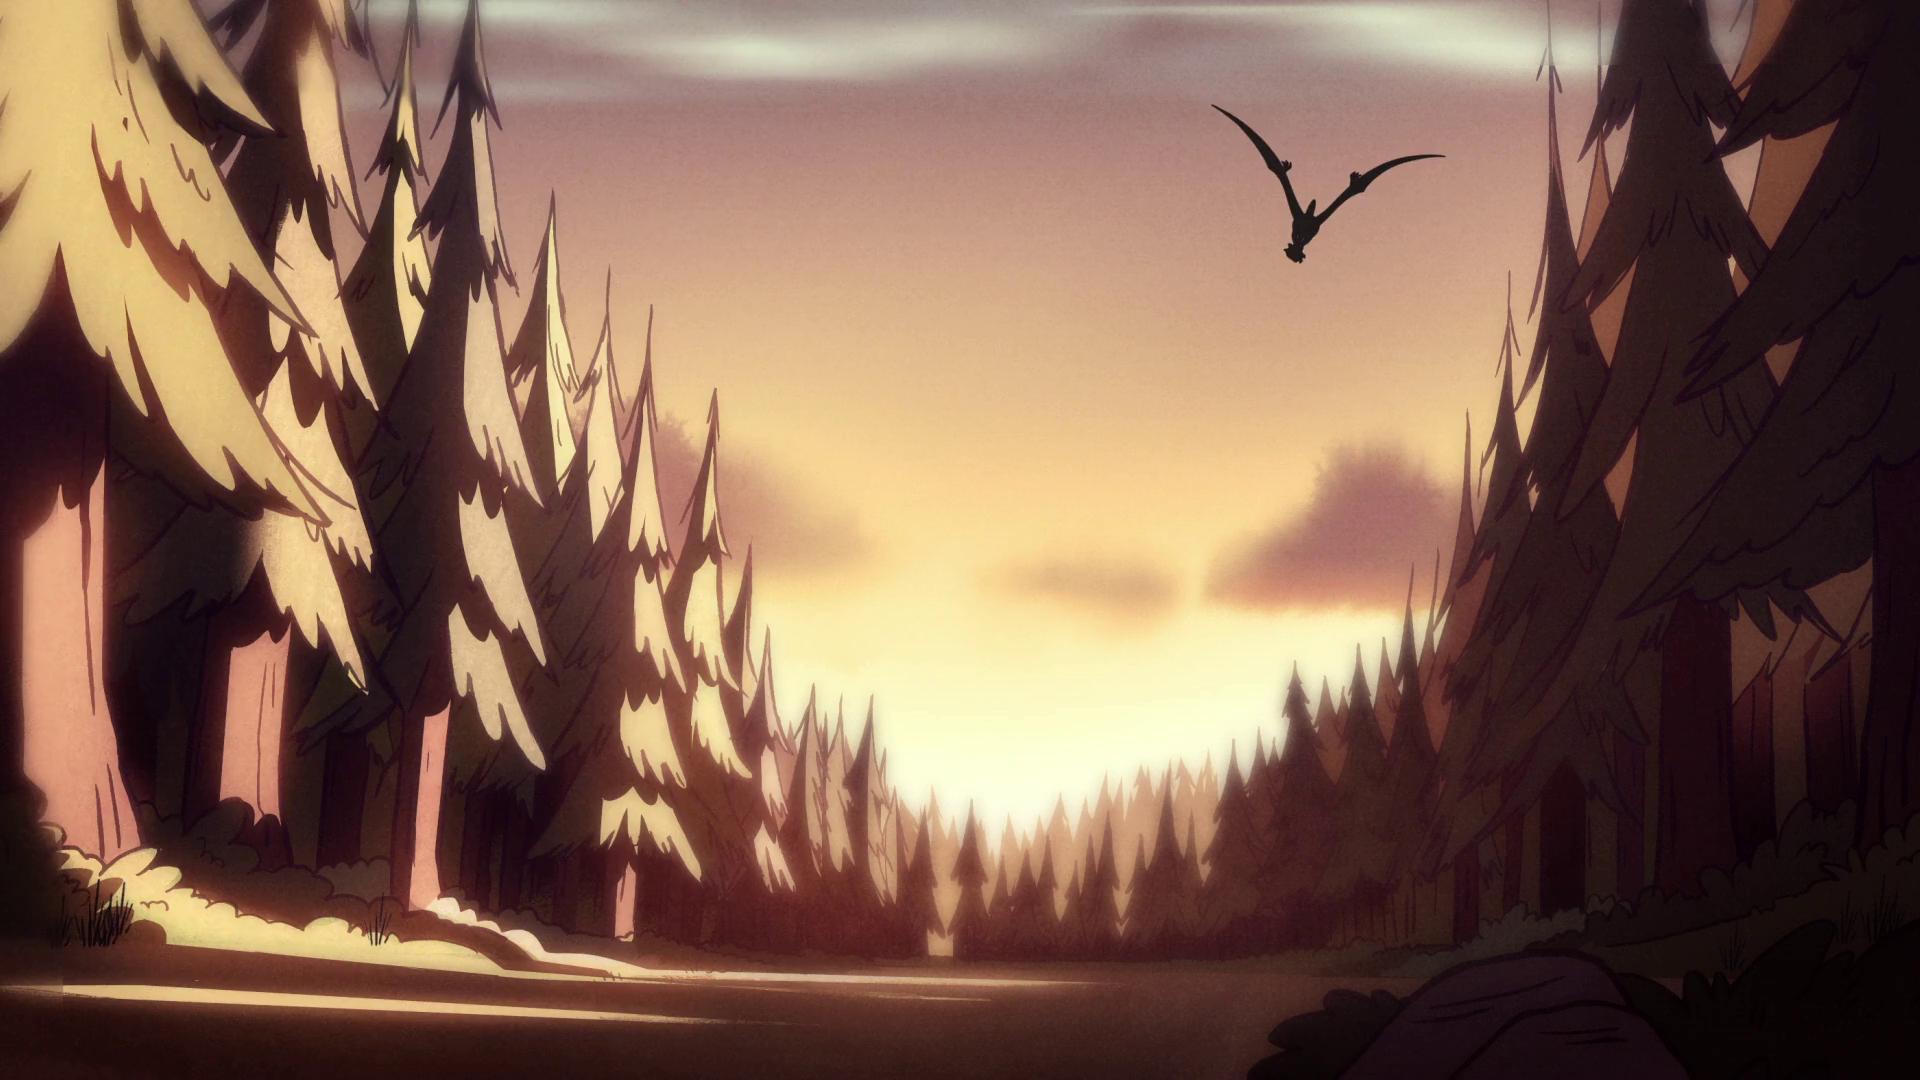 Gravity Falls Wallpaper - Gravity Falls Background , HD Wallpaper & Backgrounds